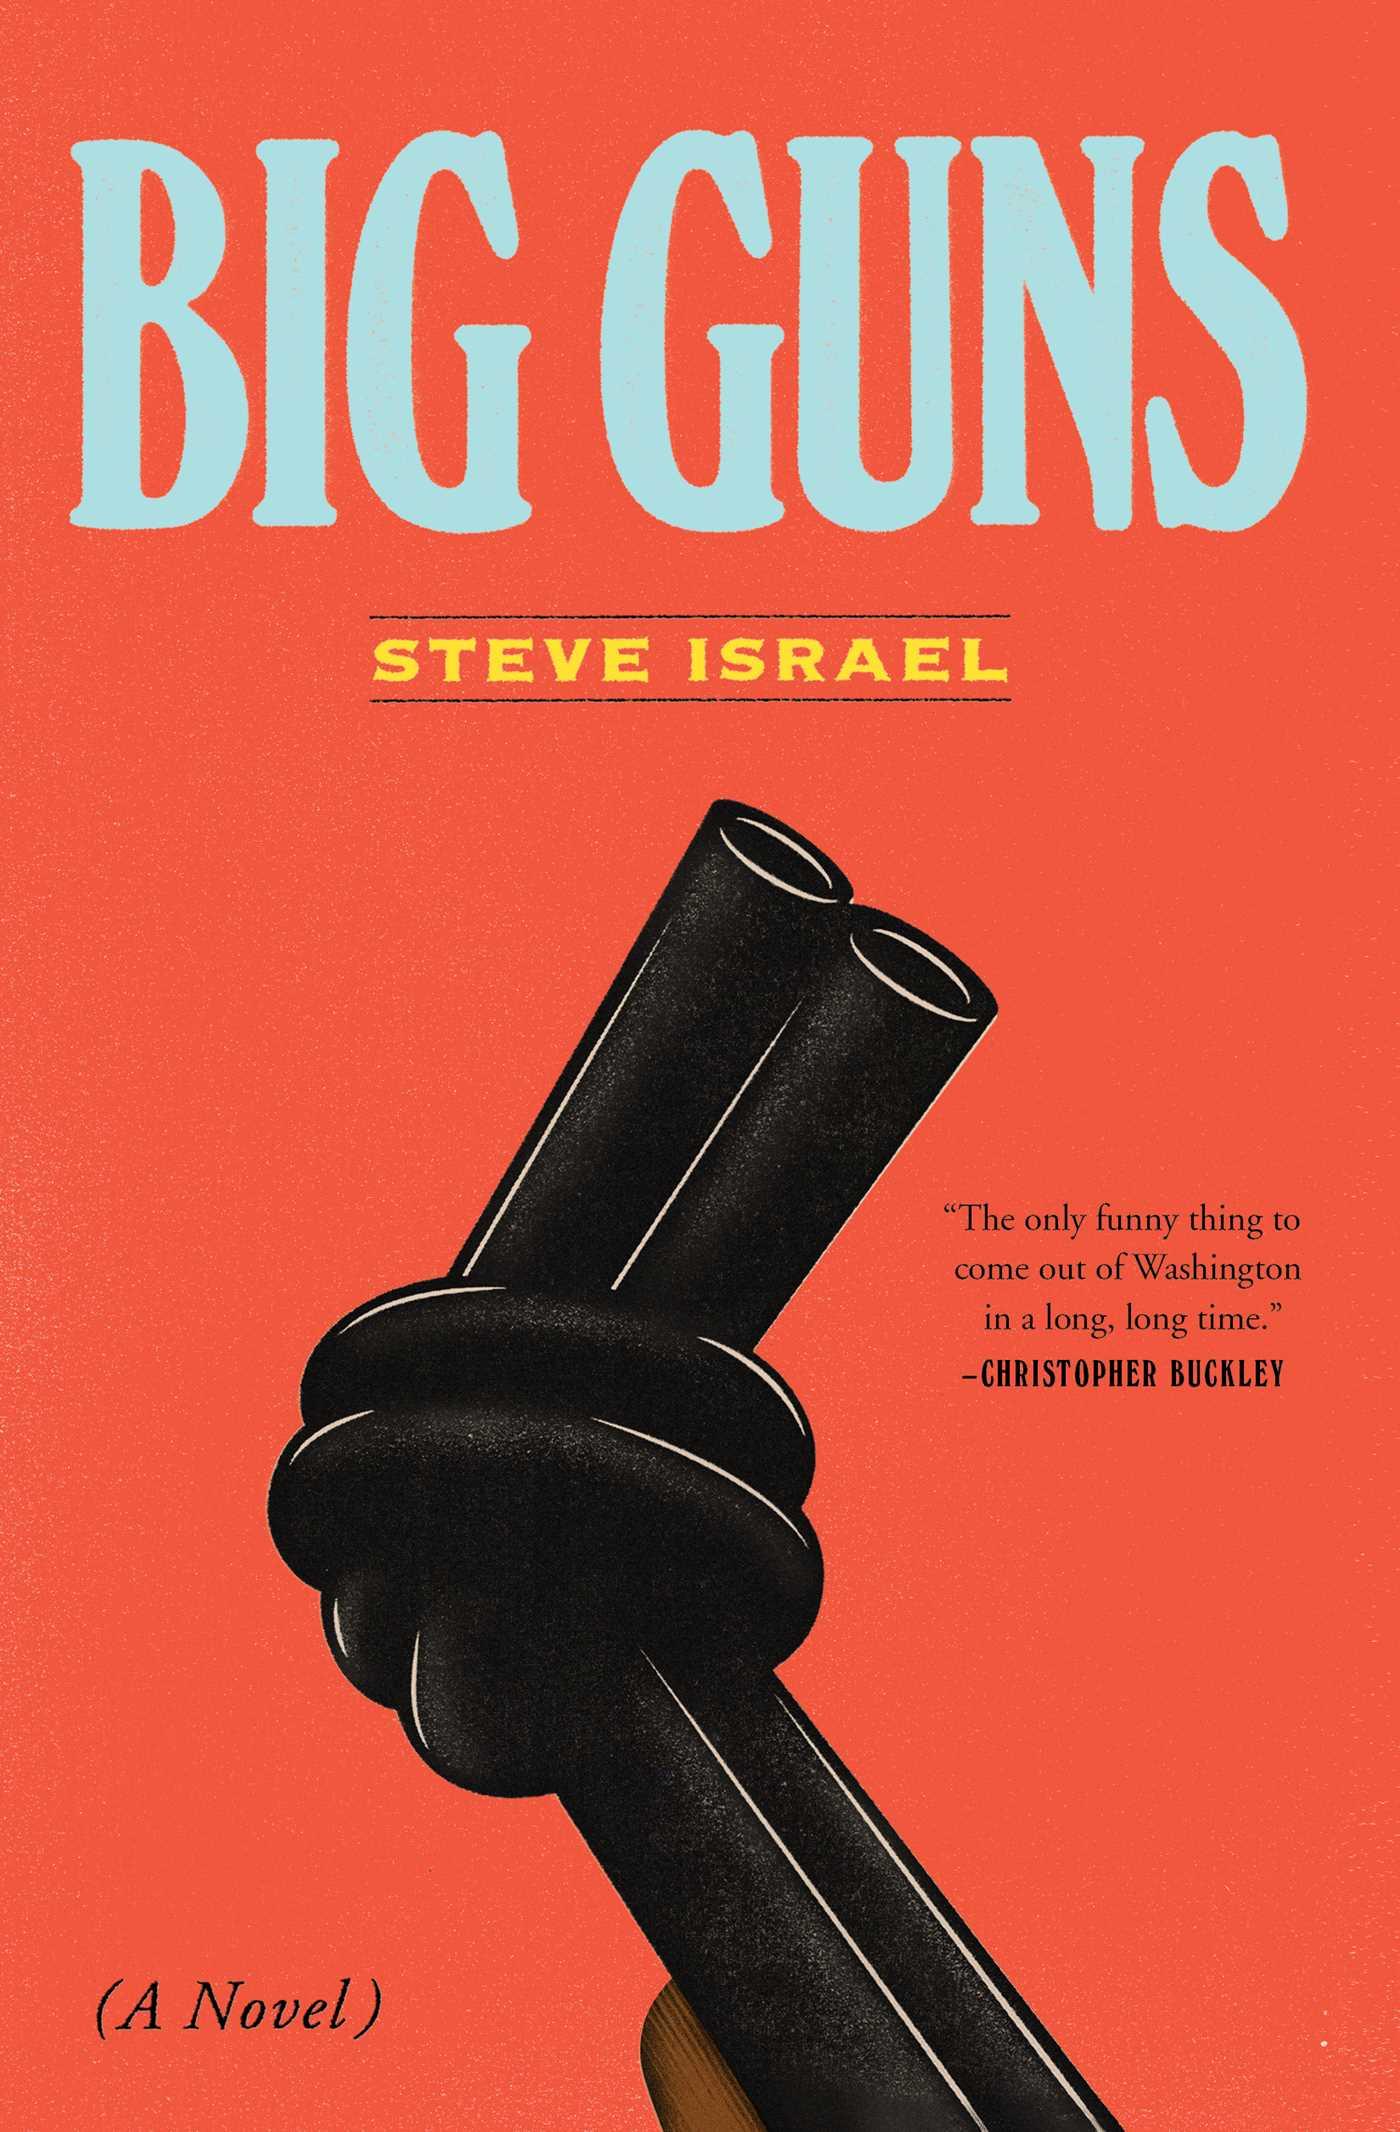 Big guns 9781501118043 hr